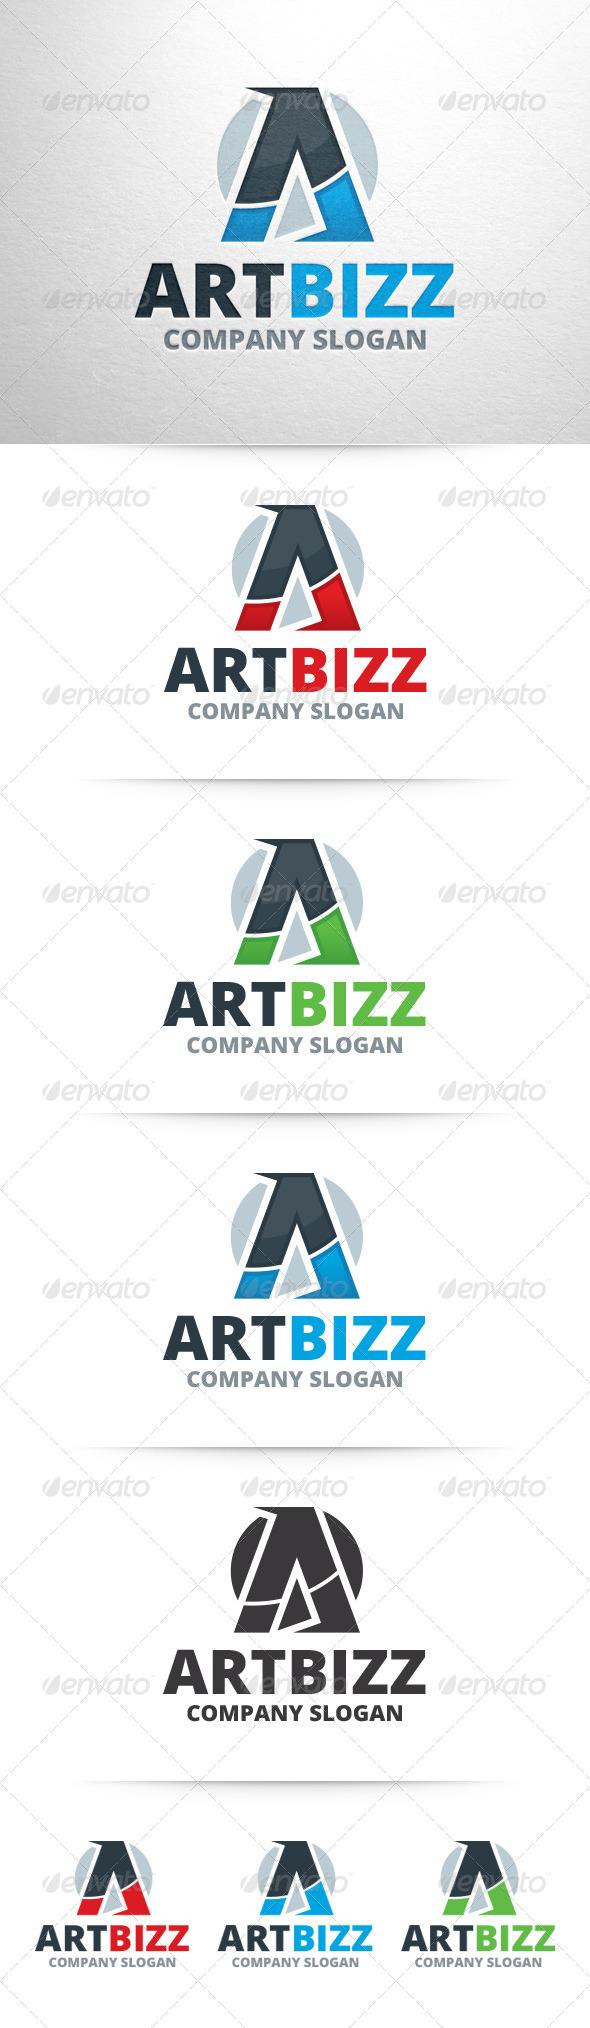 GraphicRiver Art Bizz Letter A Logo 7574273